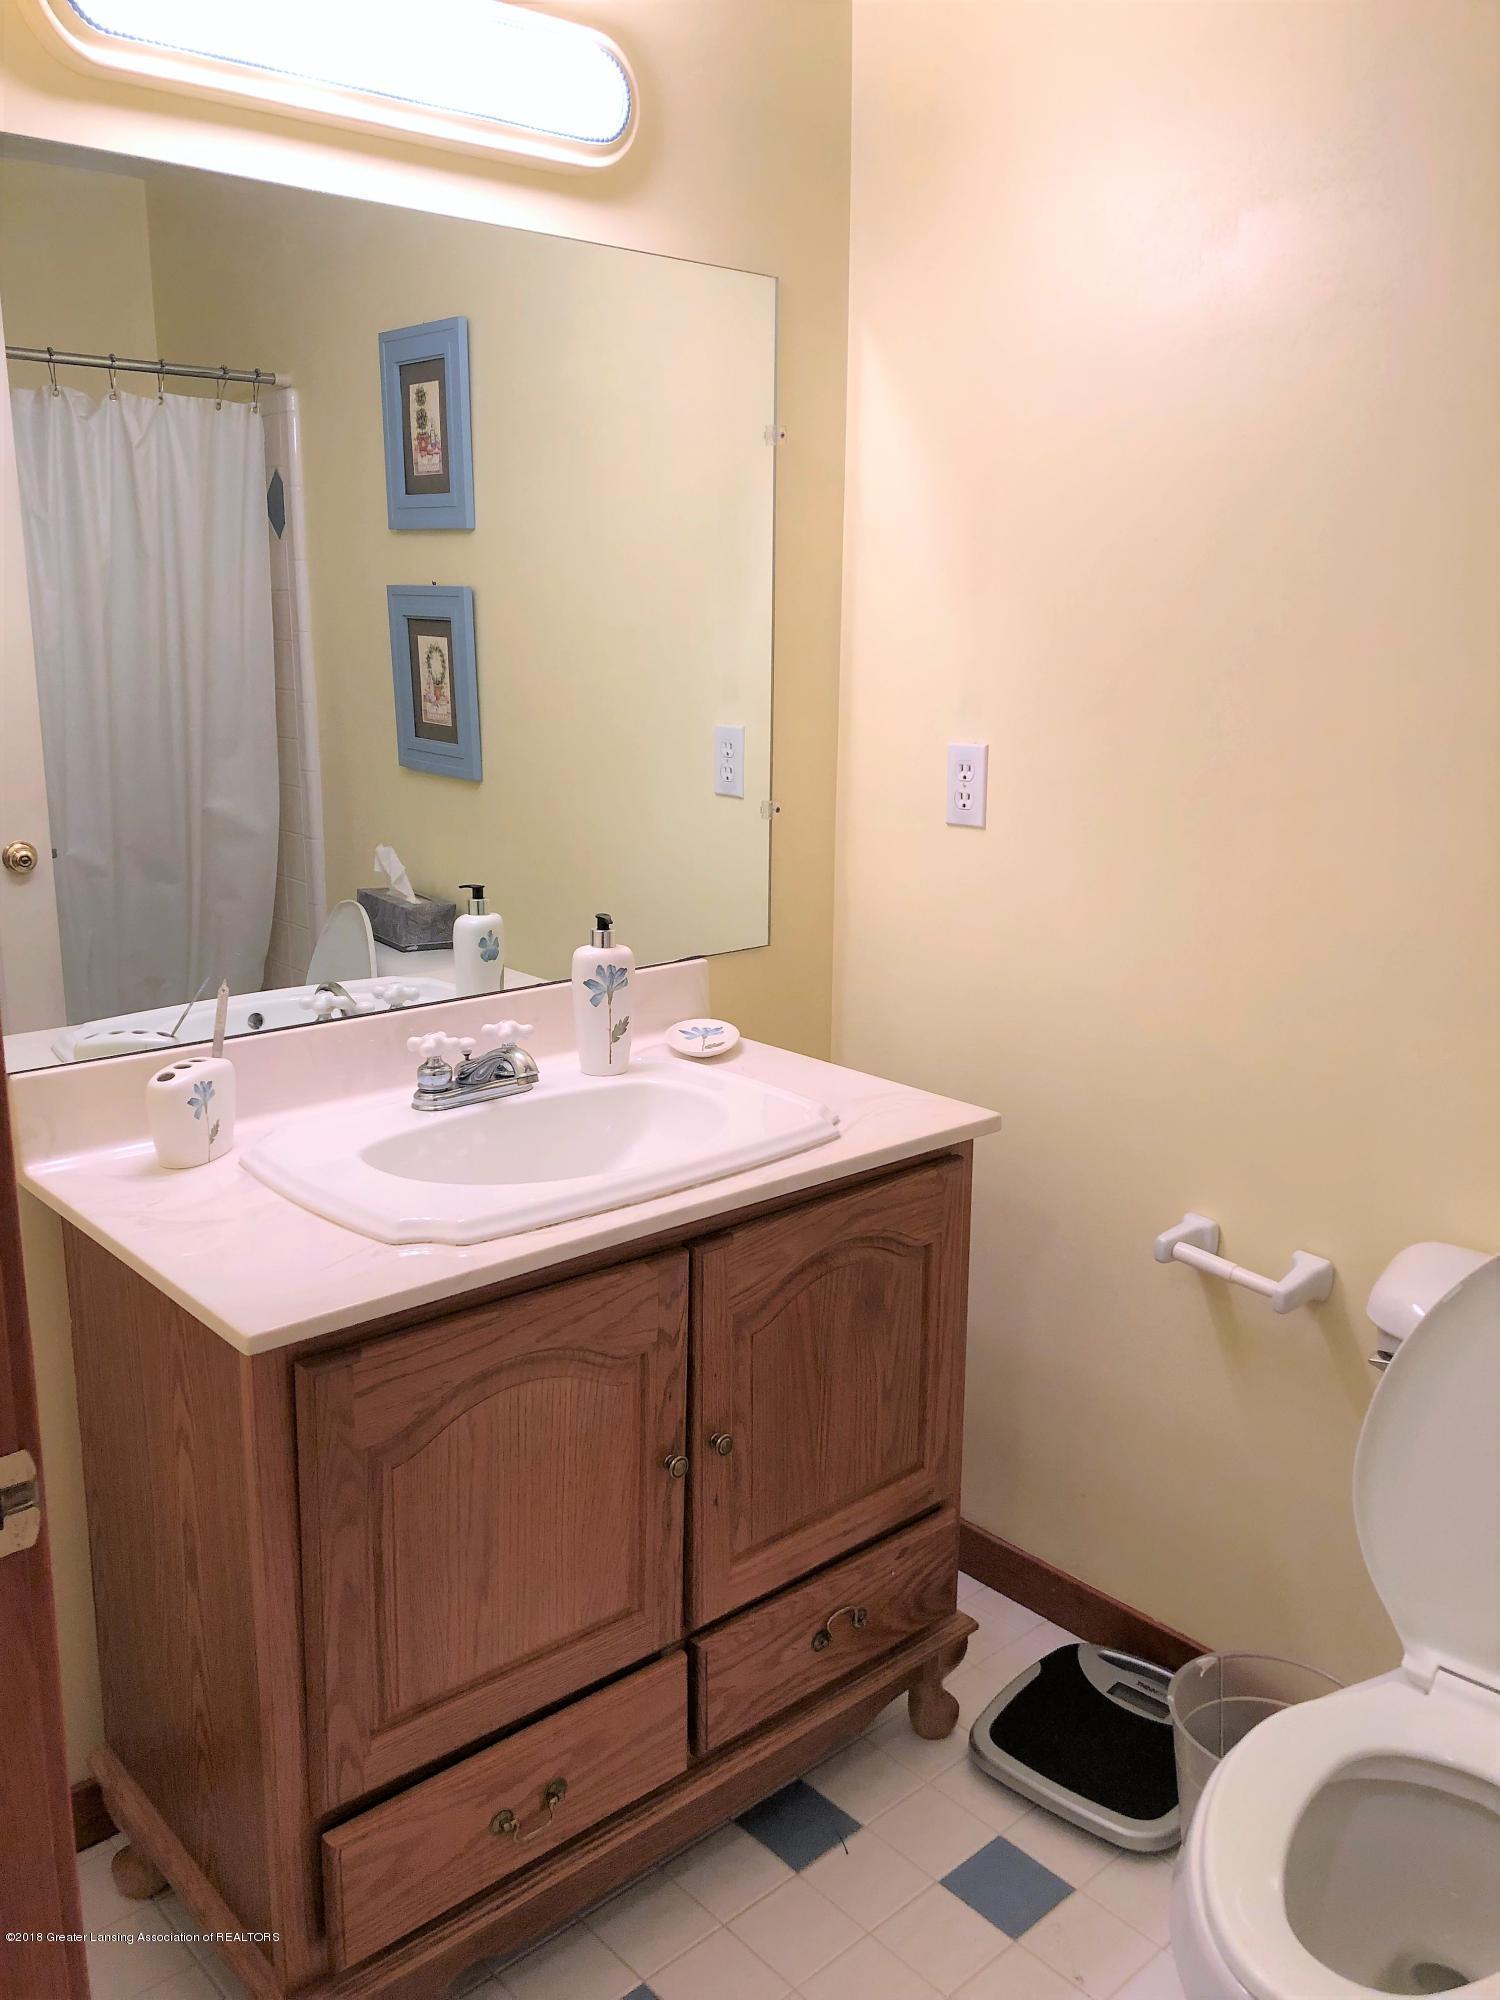 341 S Eifert Rd - Bathroom - 15